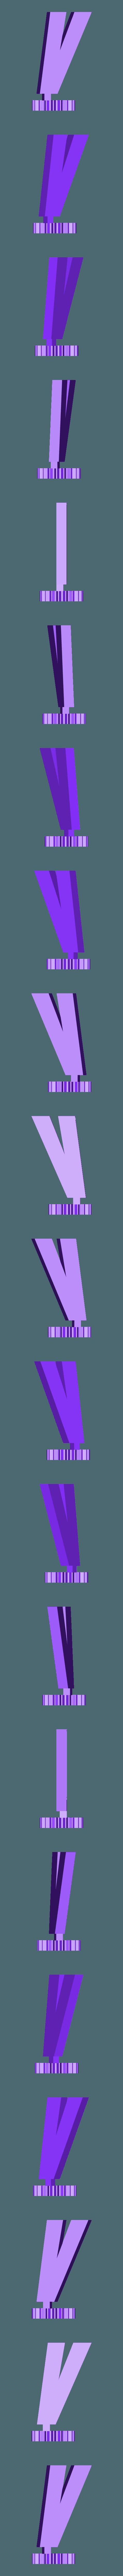 V, Avengers Logo.STL Download free STL file Avengers Rotating Logo • 3D printing template, potentprintables